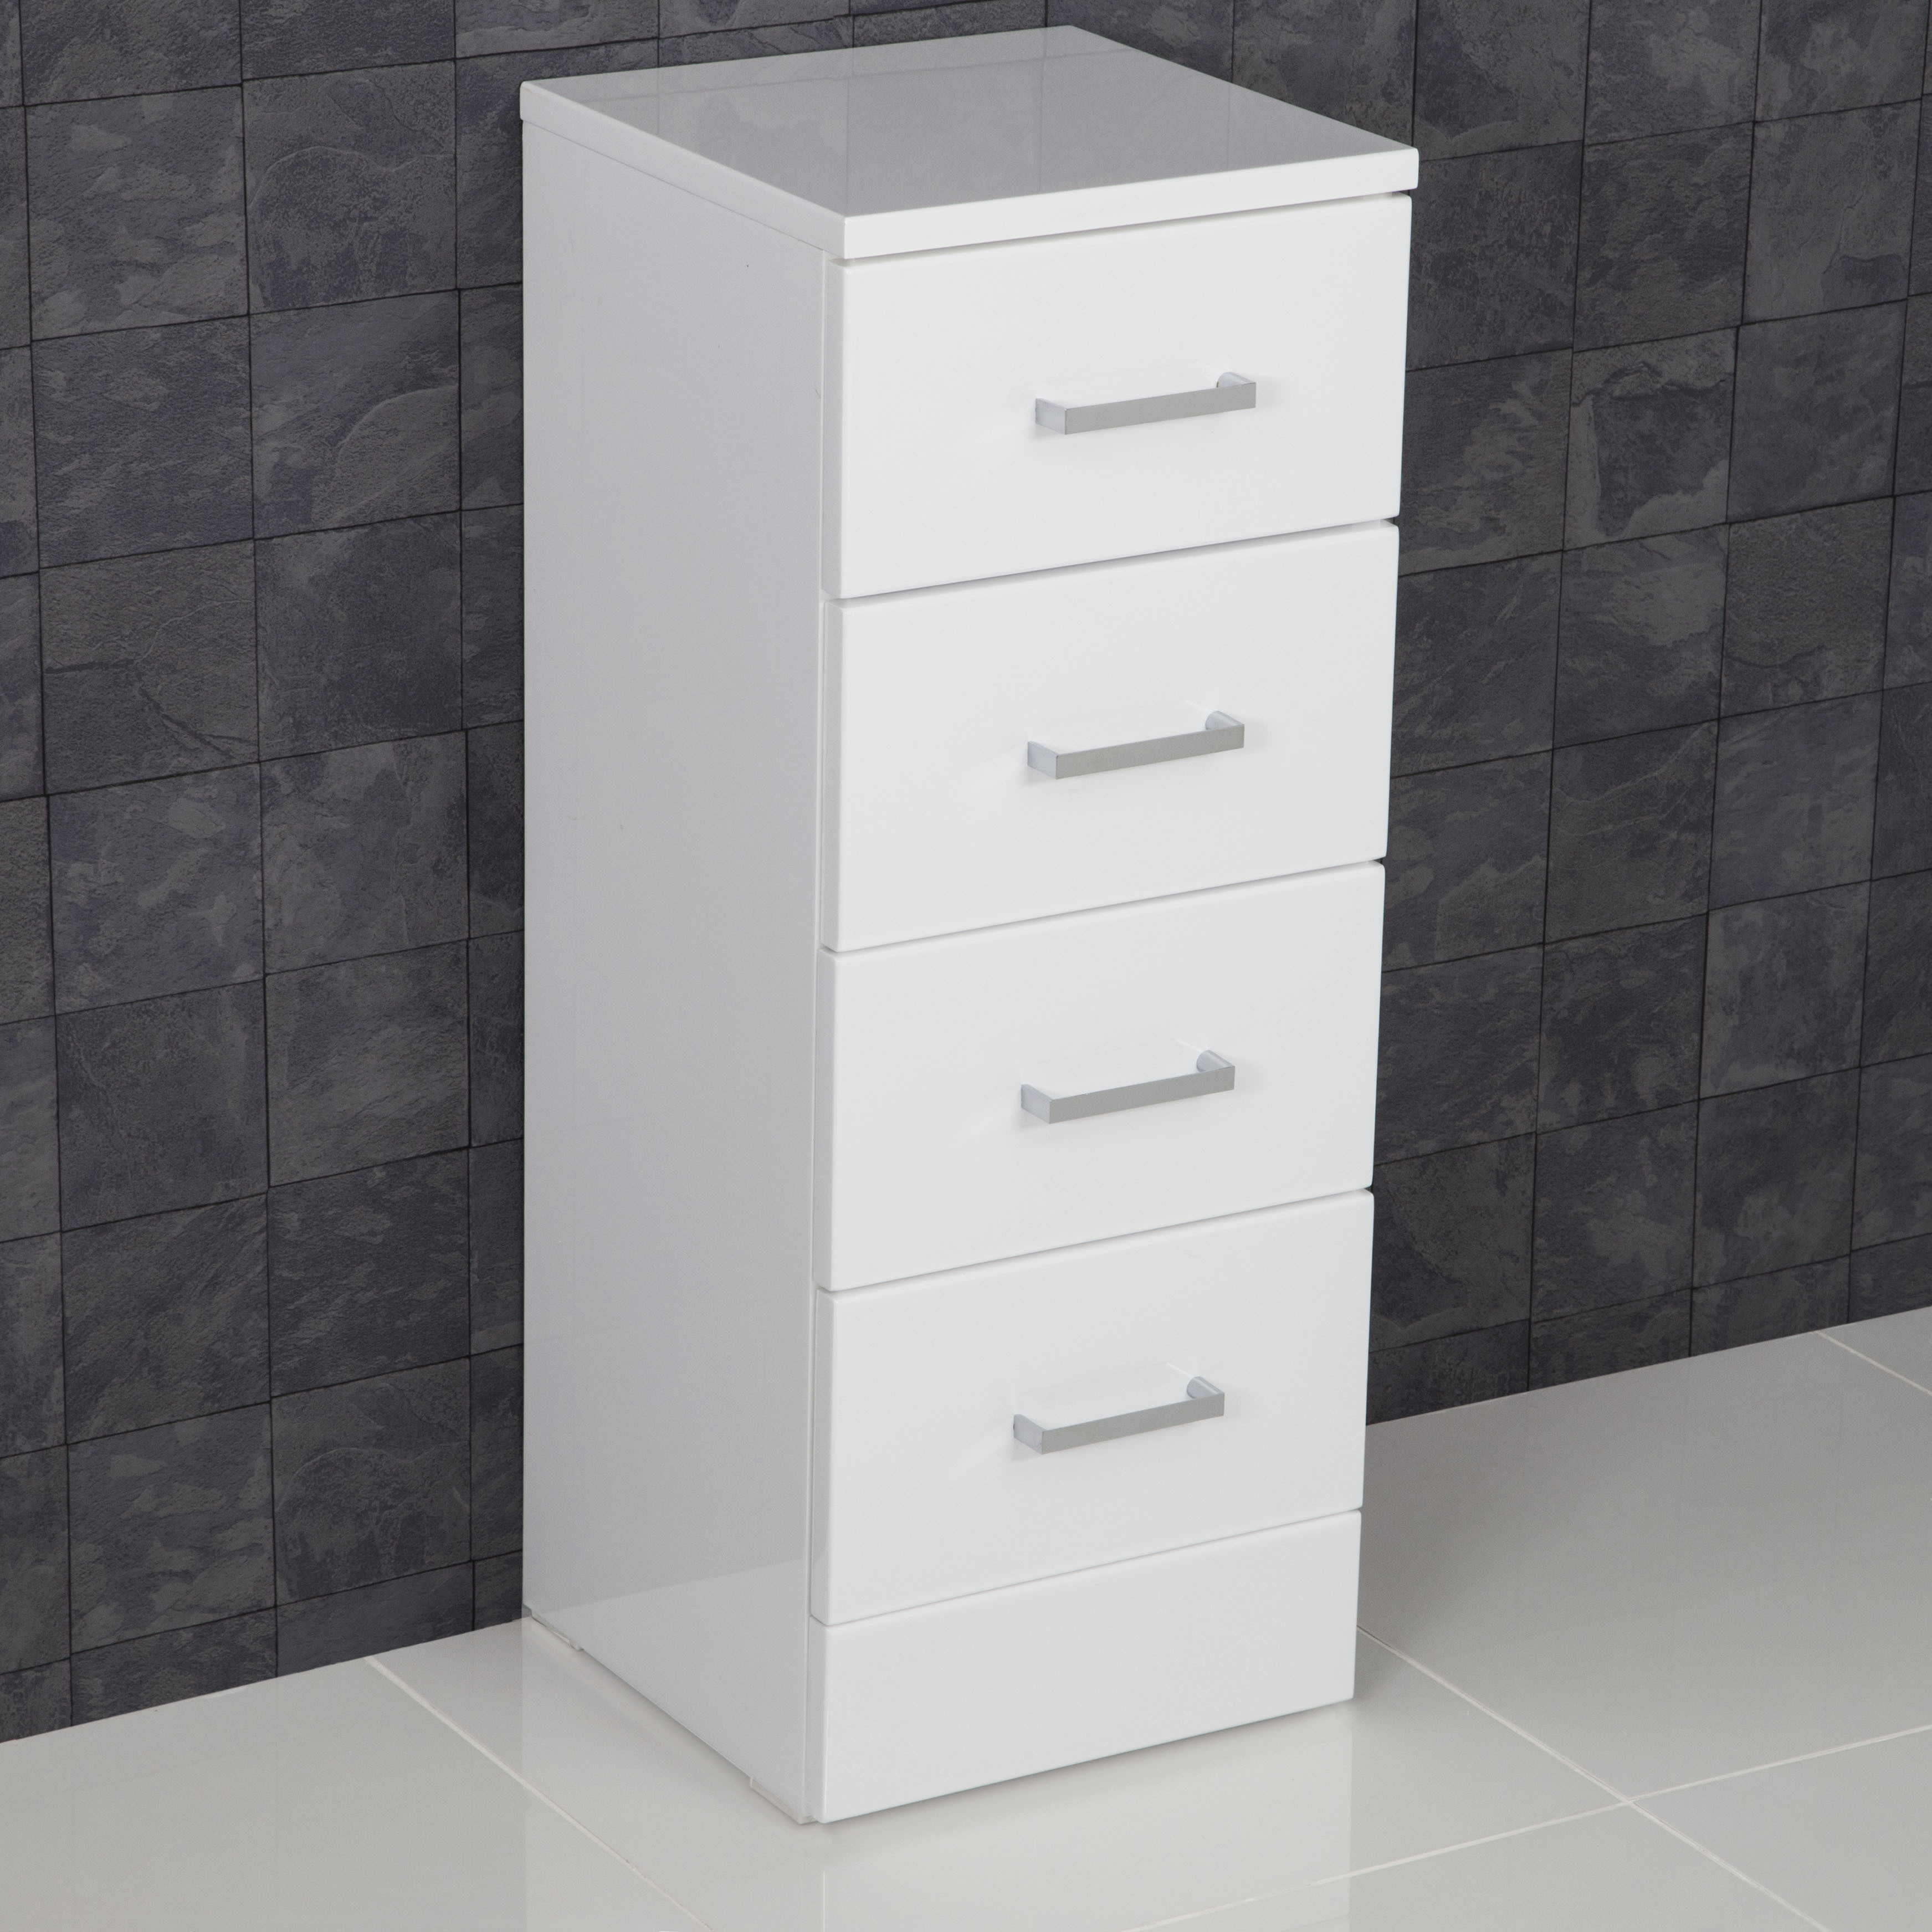 Details About Bathroom 300 X 330 4 Drawer Unit Modern Furniture Cabinet White Gloss Storage inside measurements 3487 X 3487